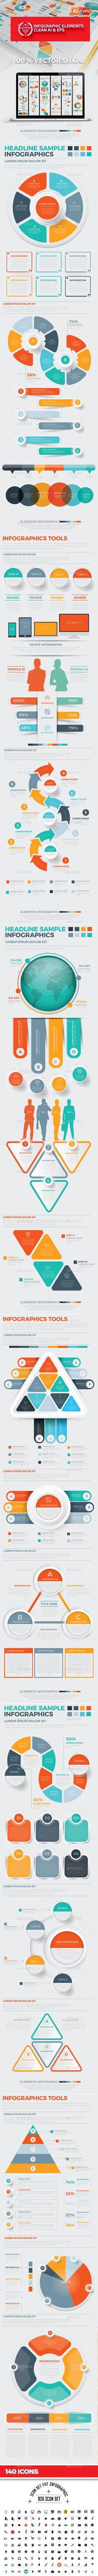 Big Infographics Design. Download: https://graphicriver.net/item/big-infographics-design/18704641?ref=thanhdesign